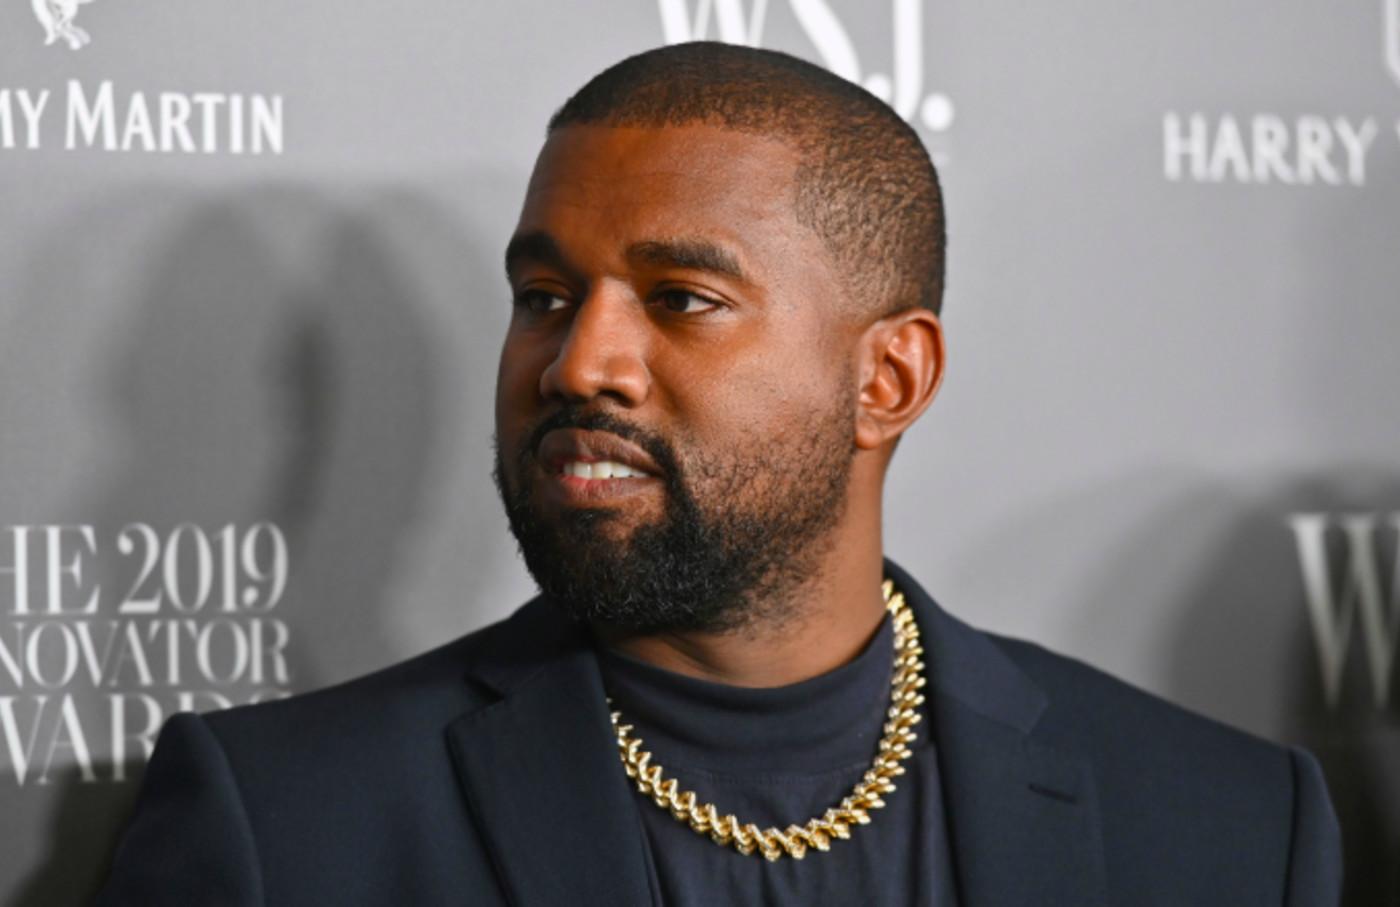 US rapper Kanye West attends the WSJ Magazine 2019 Innovator Awards